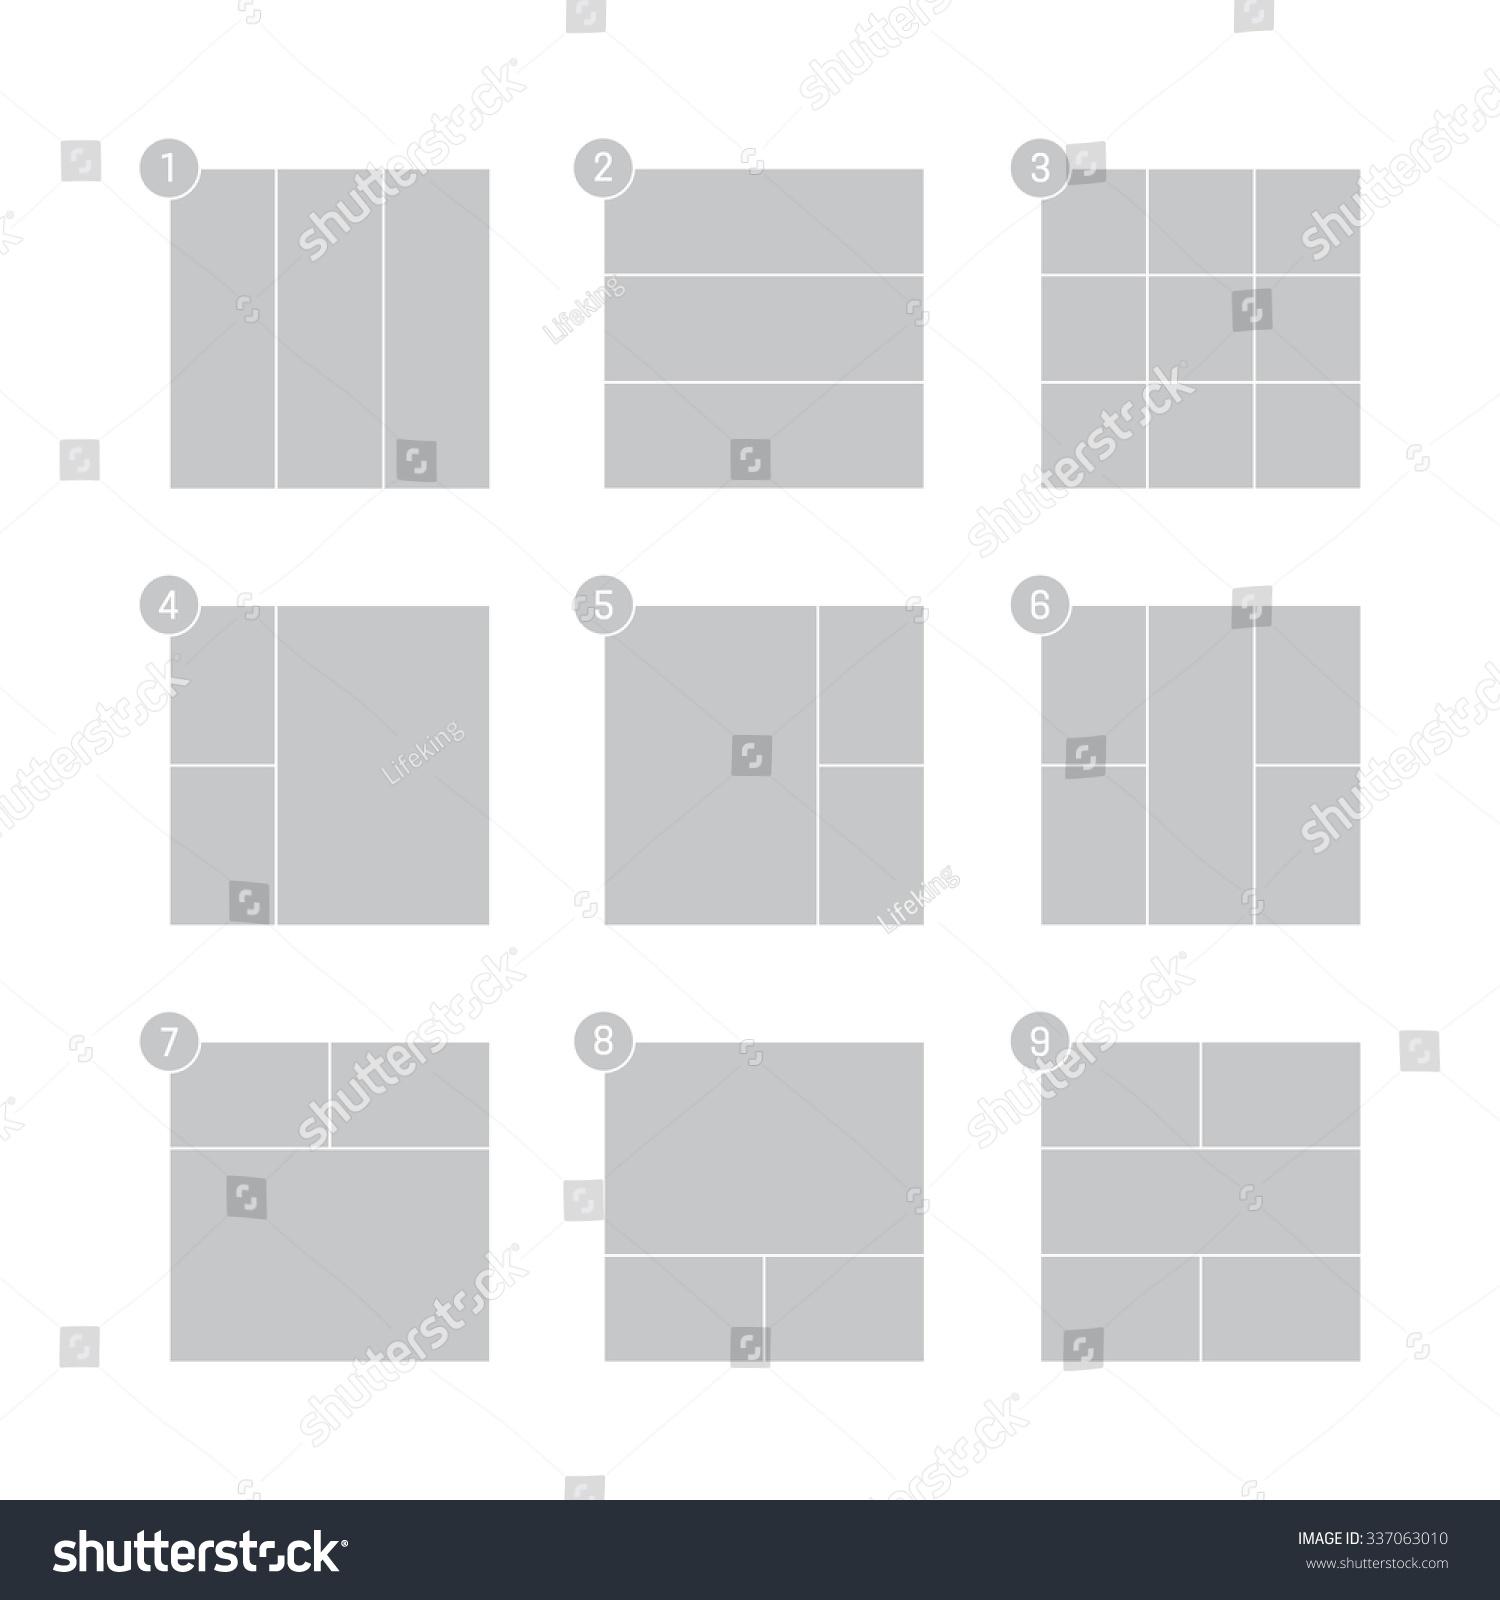 mood board vector templates 337063010 shutterstock